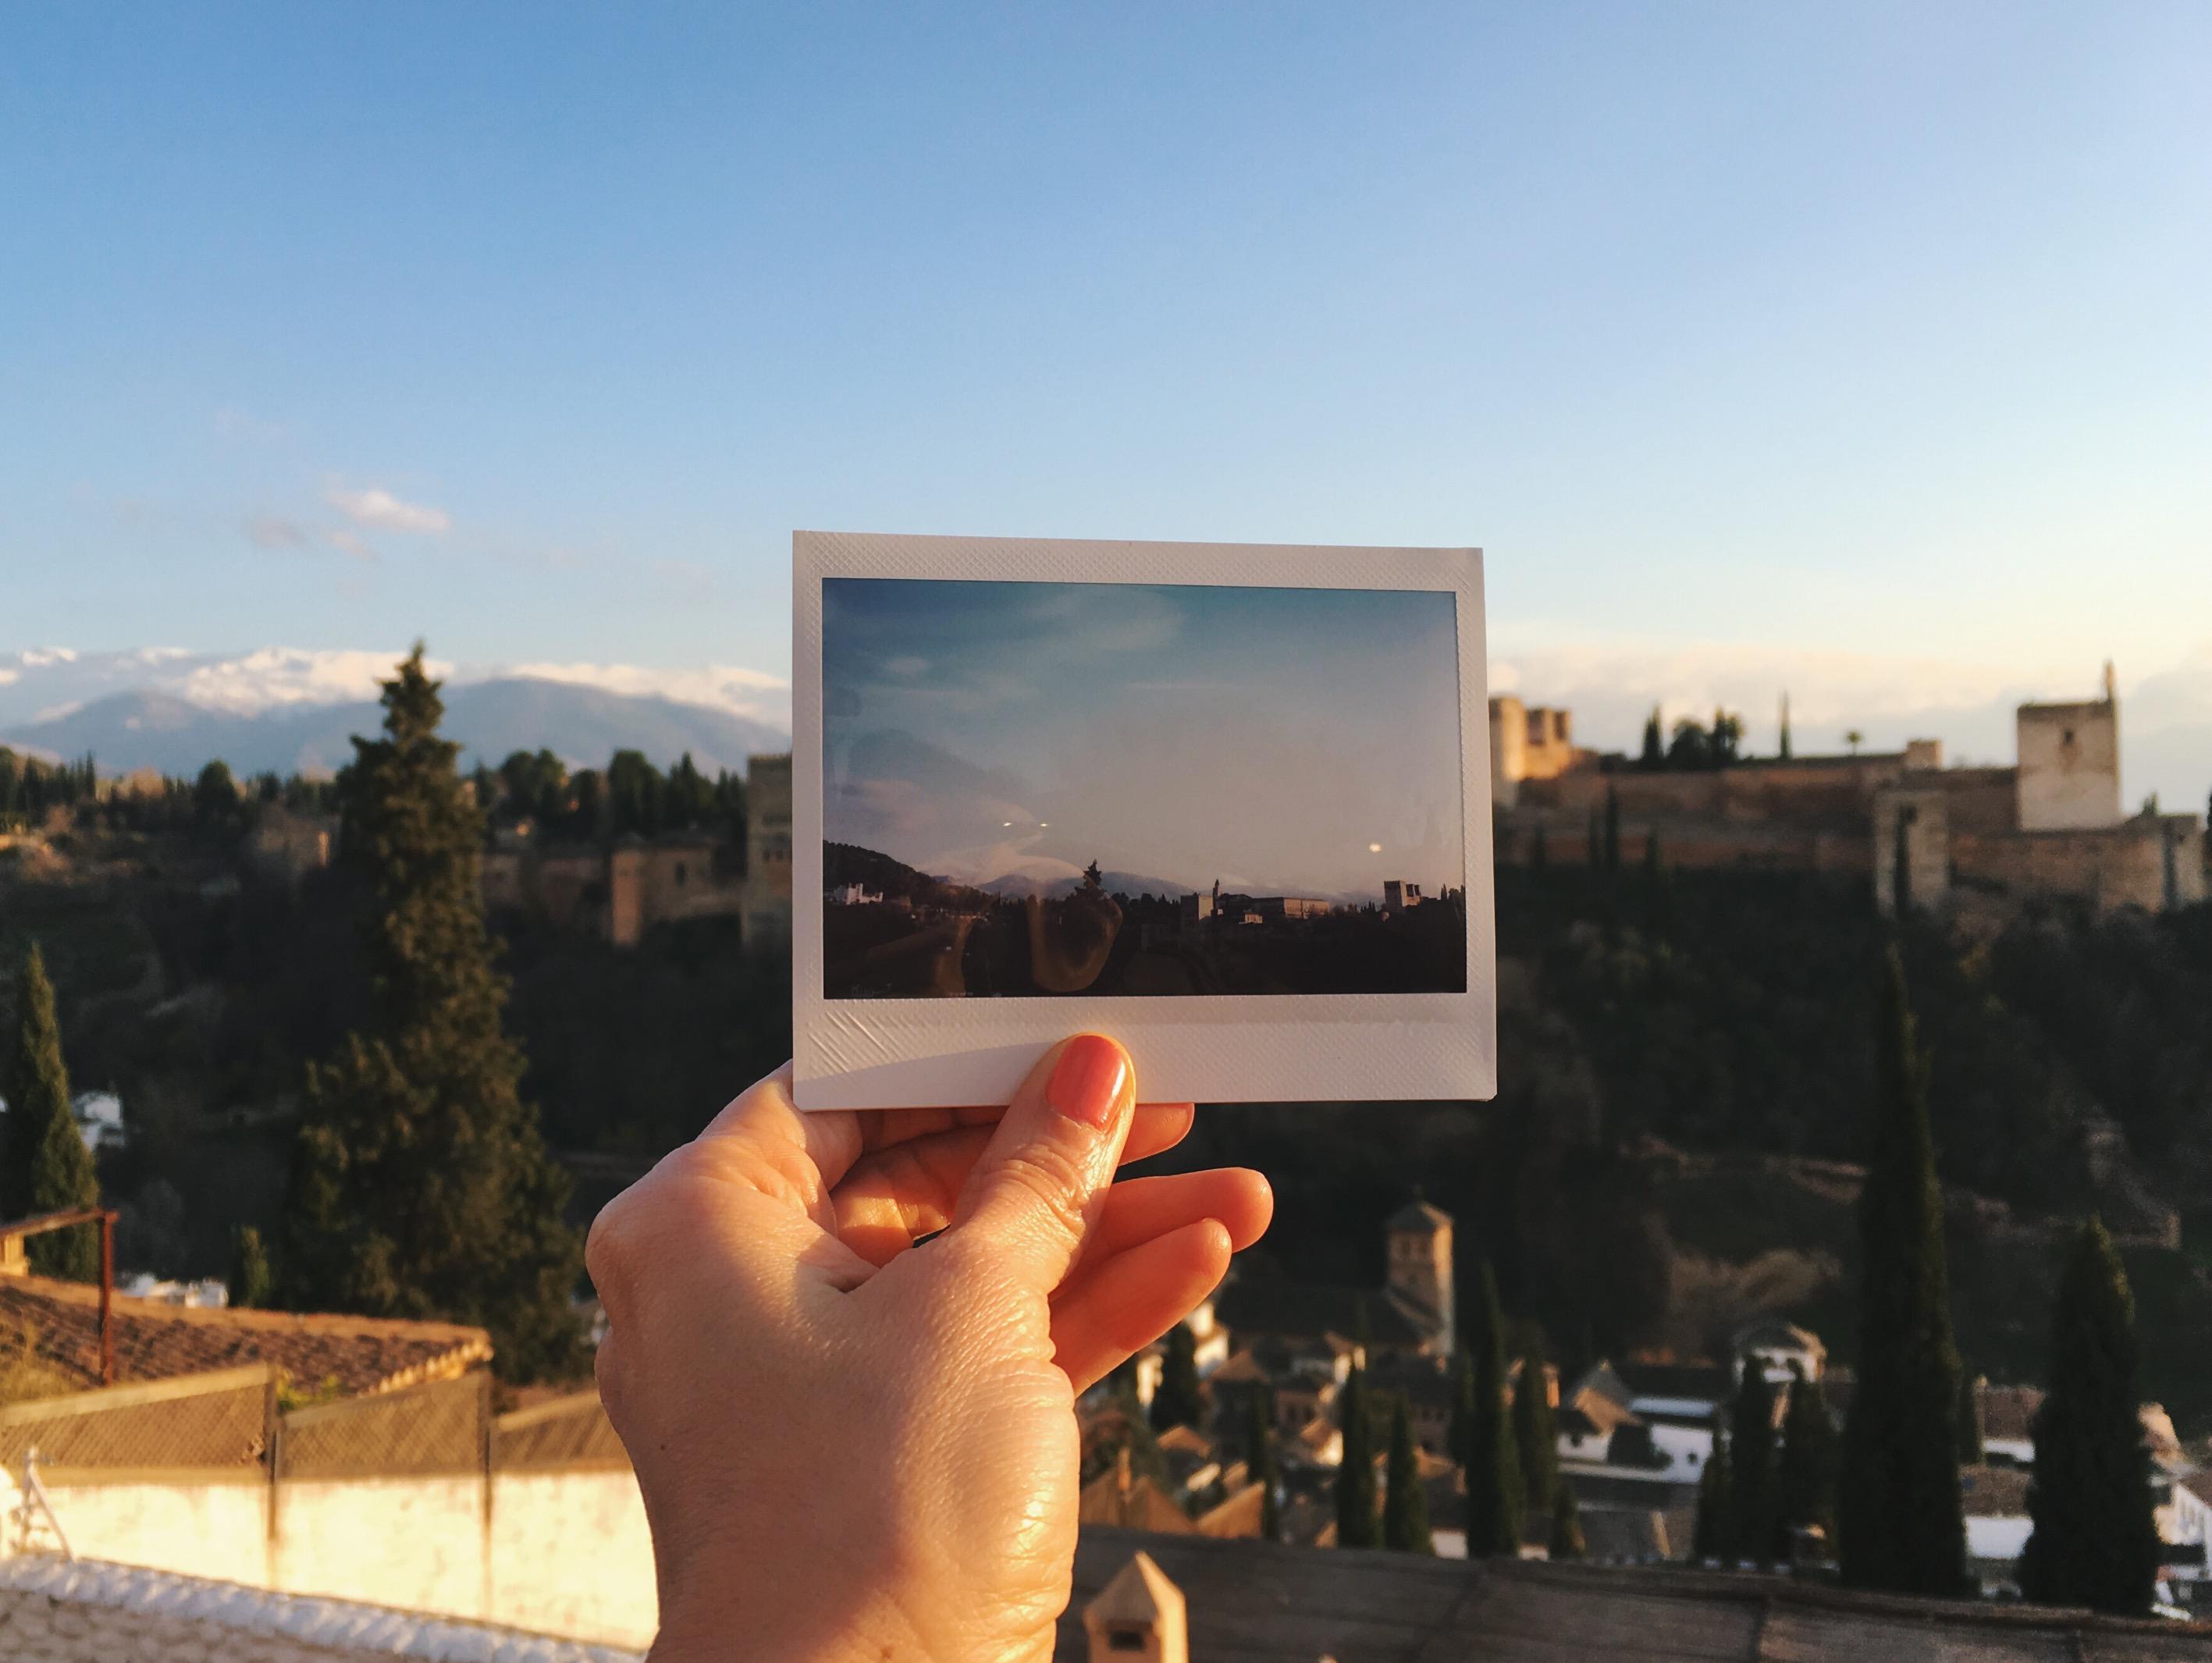 View of La Alhambra from the San Nicolás Mirador.